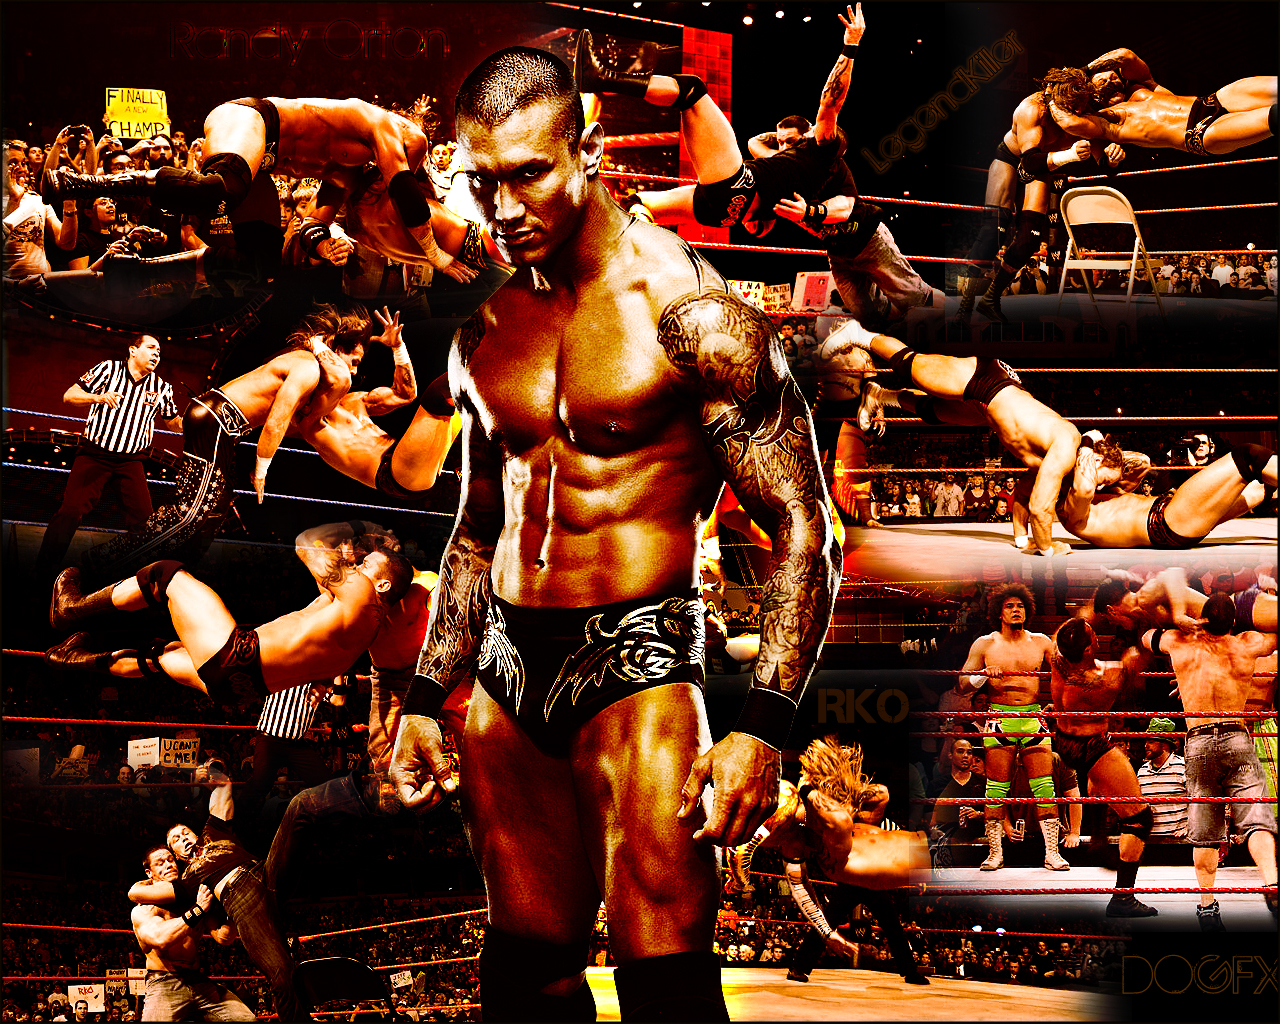 wwe Randy Orton Wallpapers 2011 Wrestling Stars 1280x1024